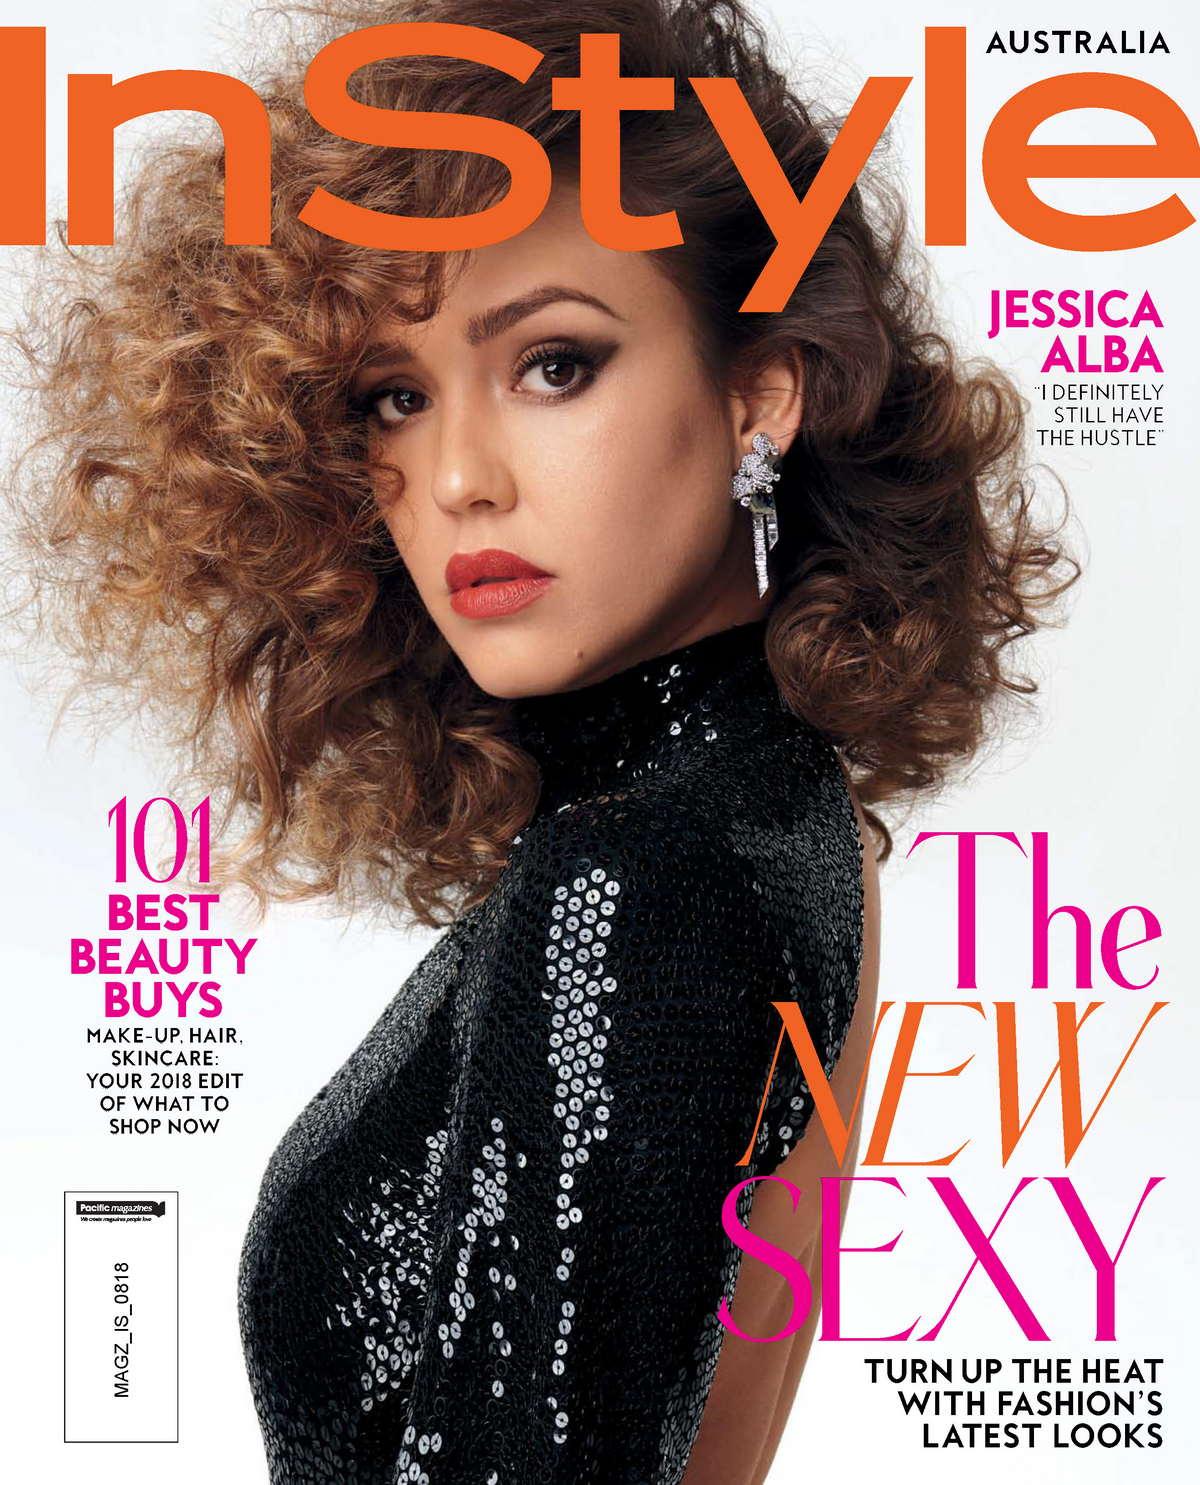 Jessica-Alba-InStyle-Australia-August-201800001.jpg